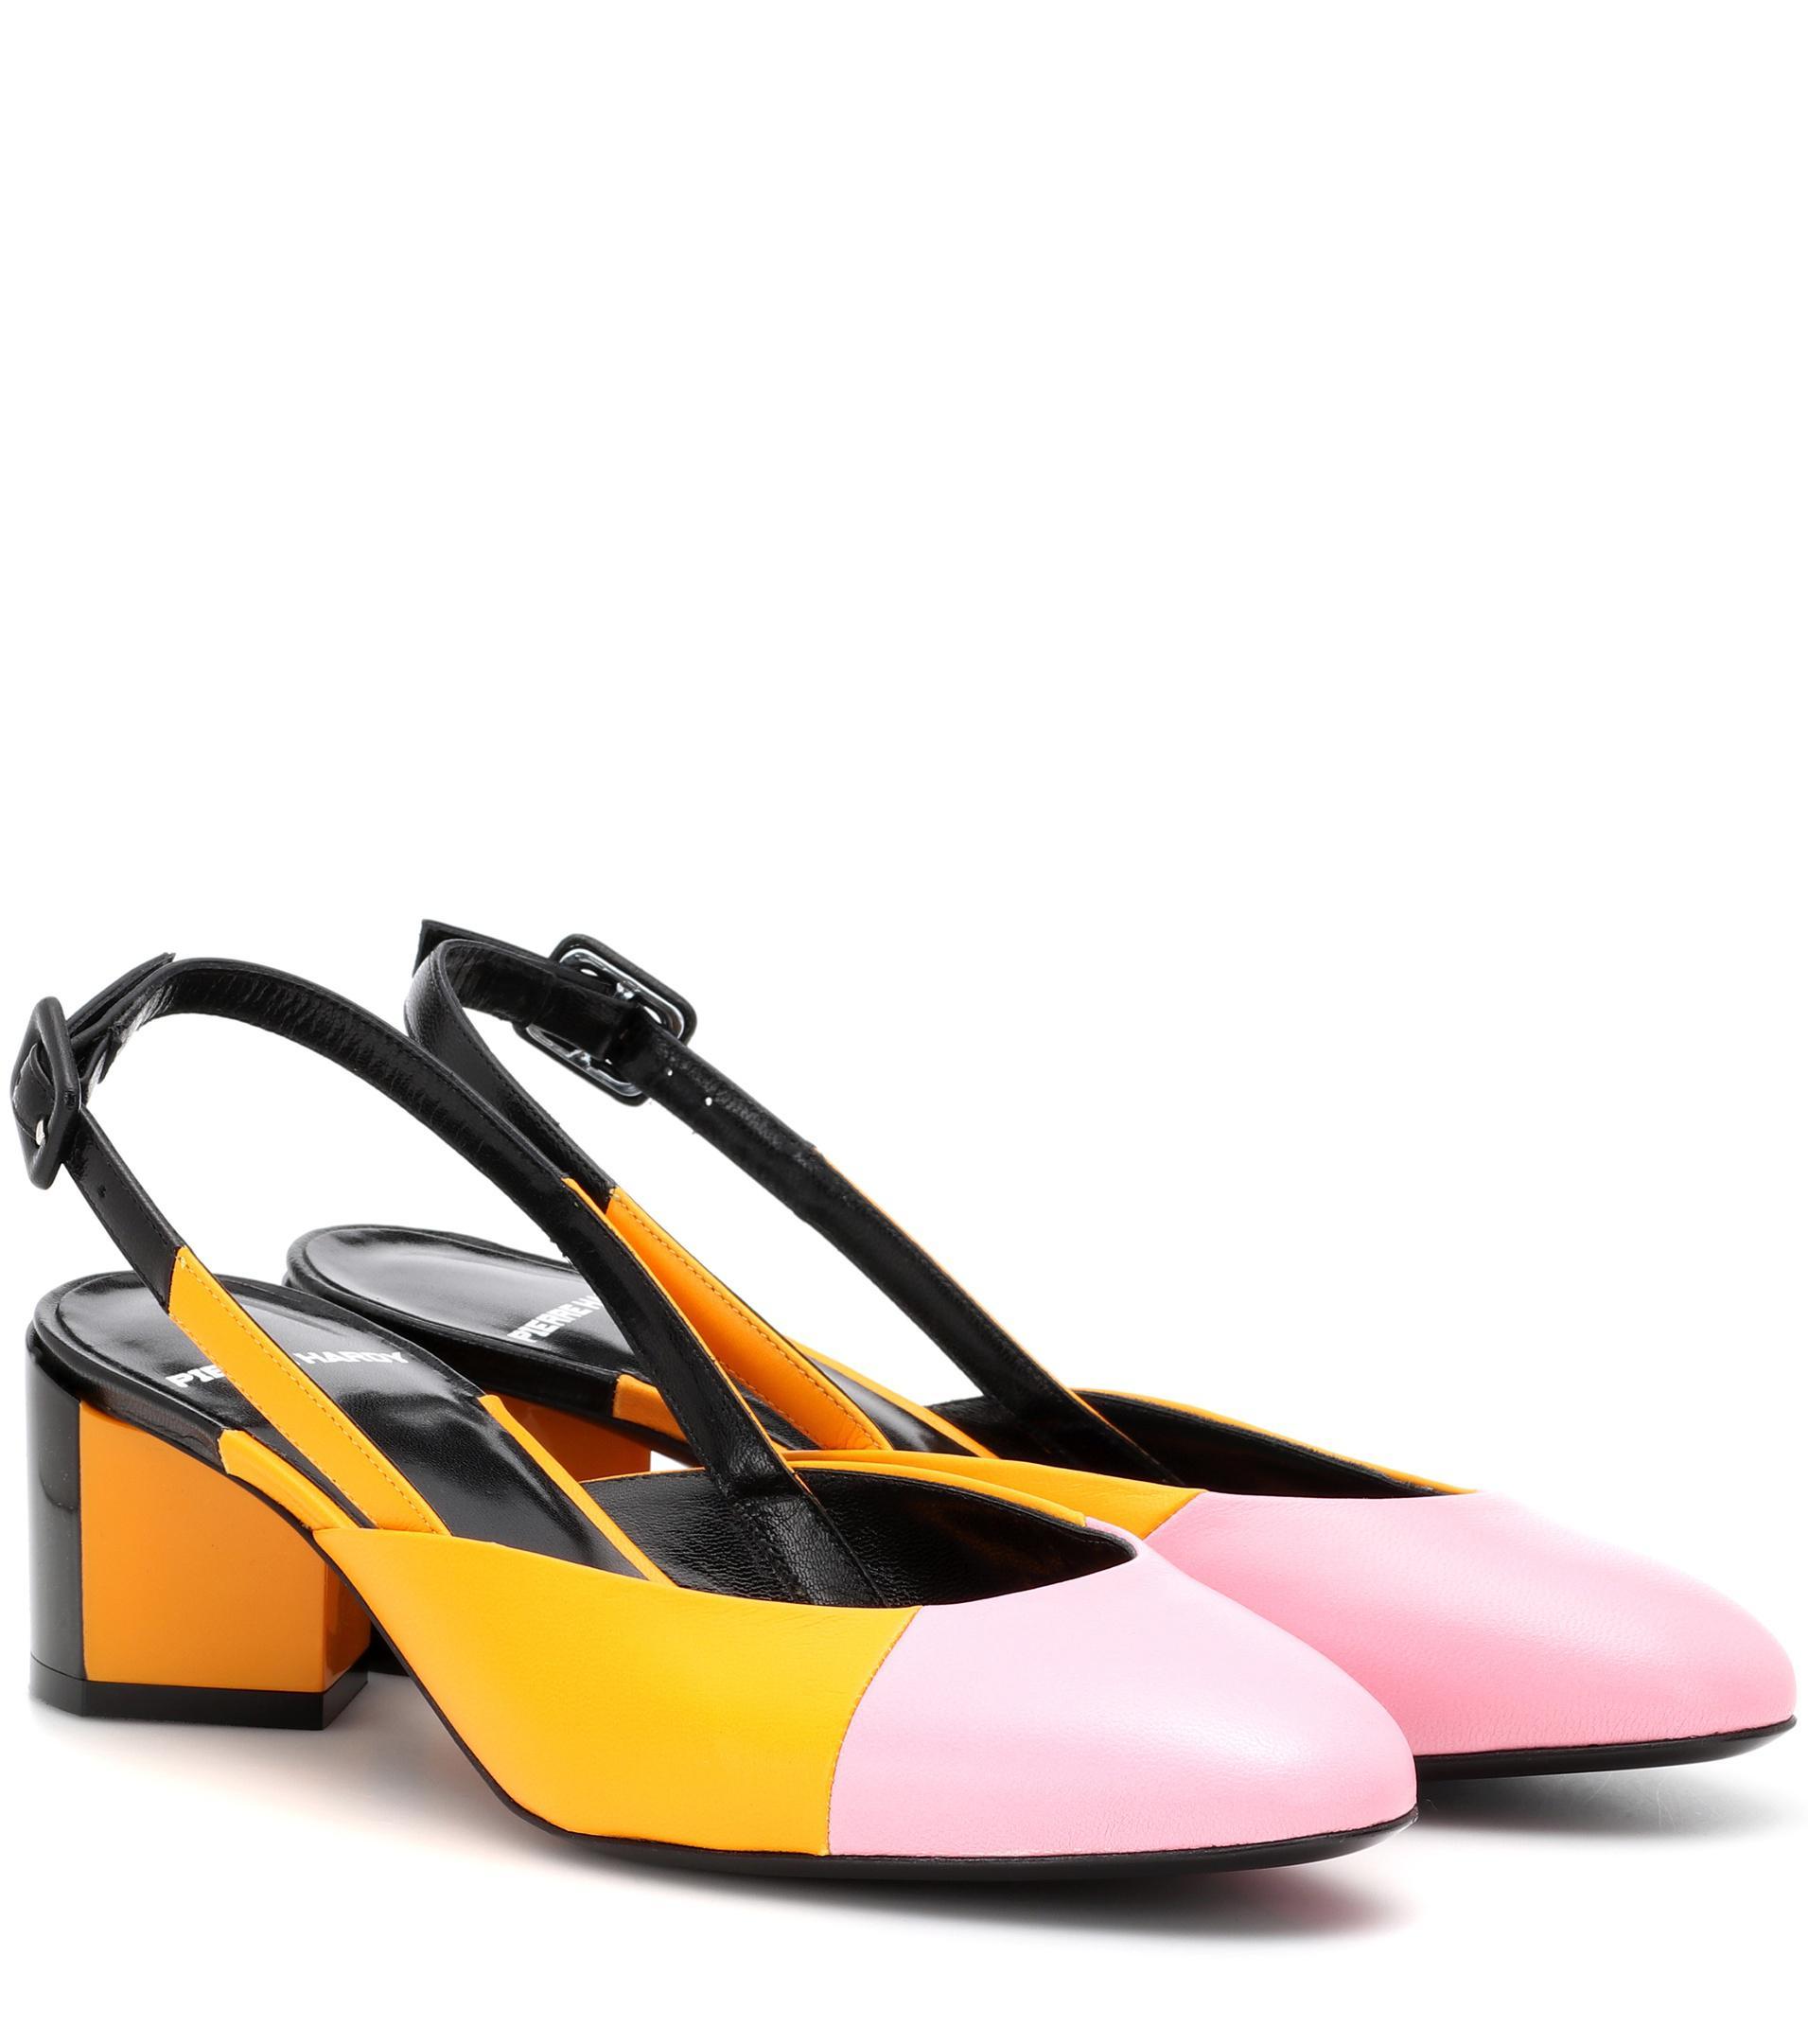 Cut Slingback pumps - Multicolour Pierre Hardy SIyx4xSqY1